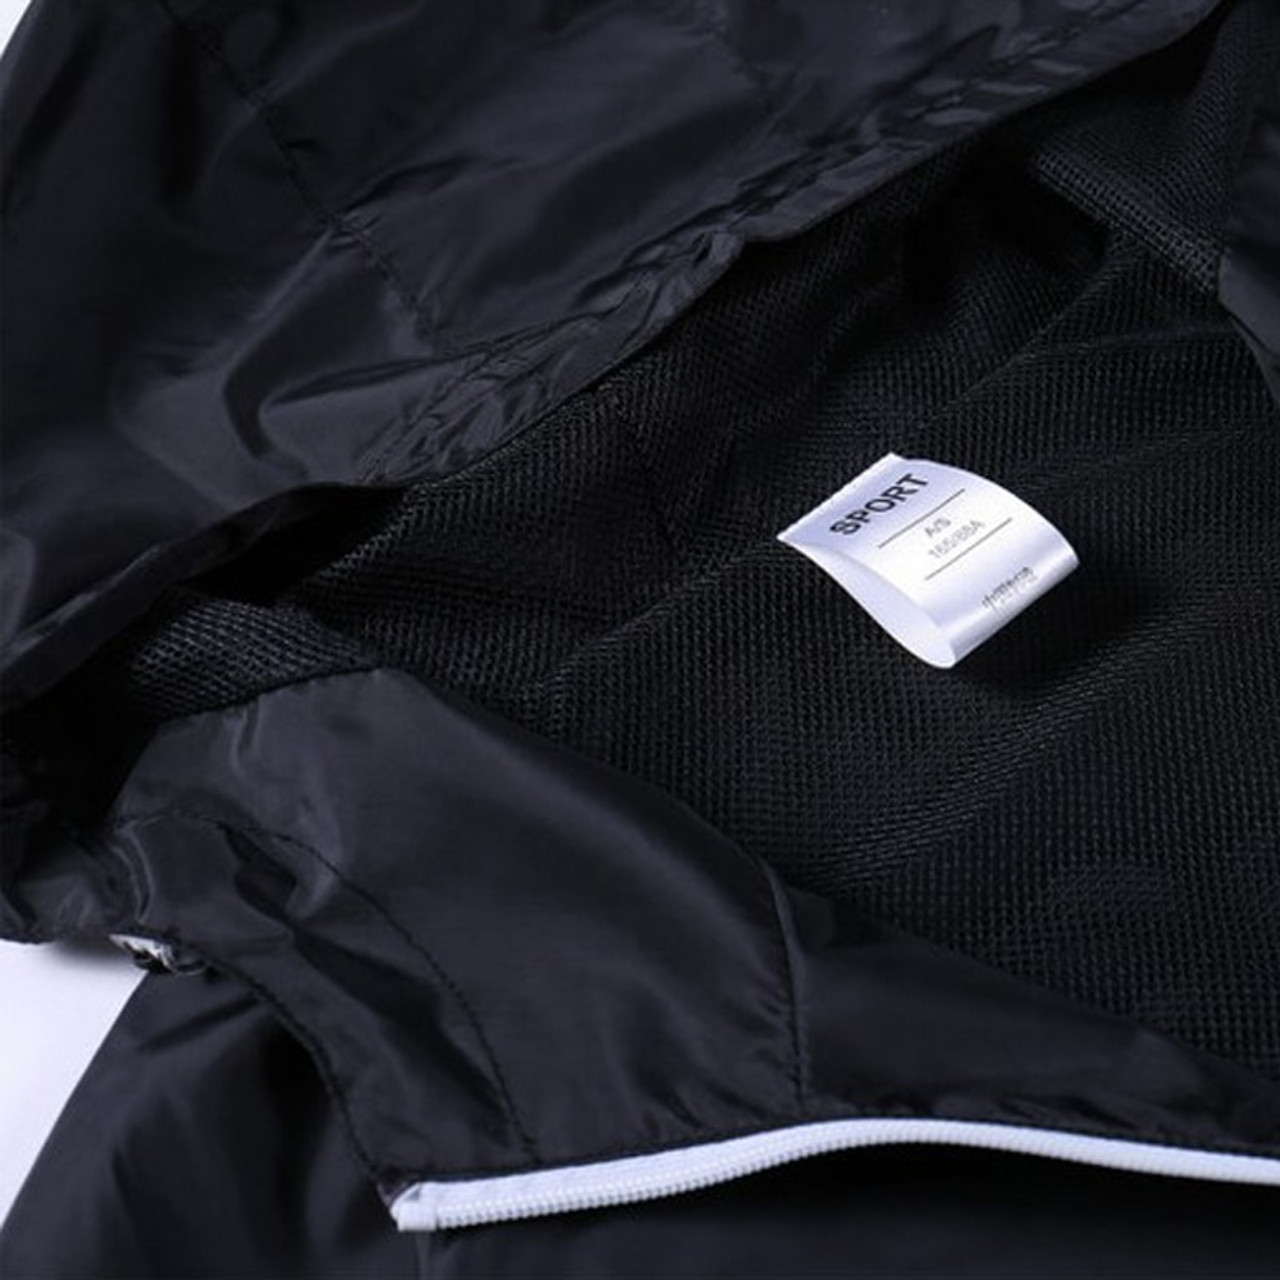 2f28507de9b3 ... 2018 New Spring Summer Mens Fashion Outerwear Windbreaker Men  S Thin  Jackets Hooded Casual Sporting ...